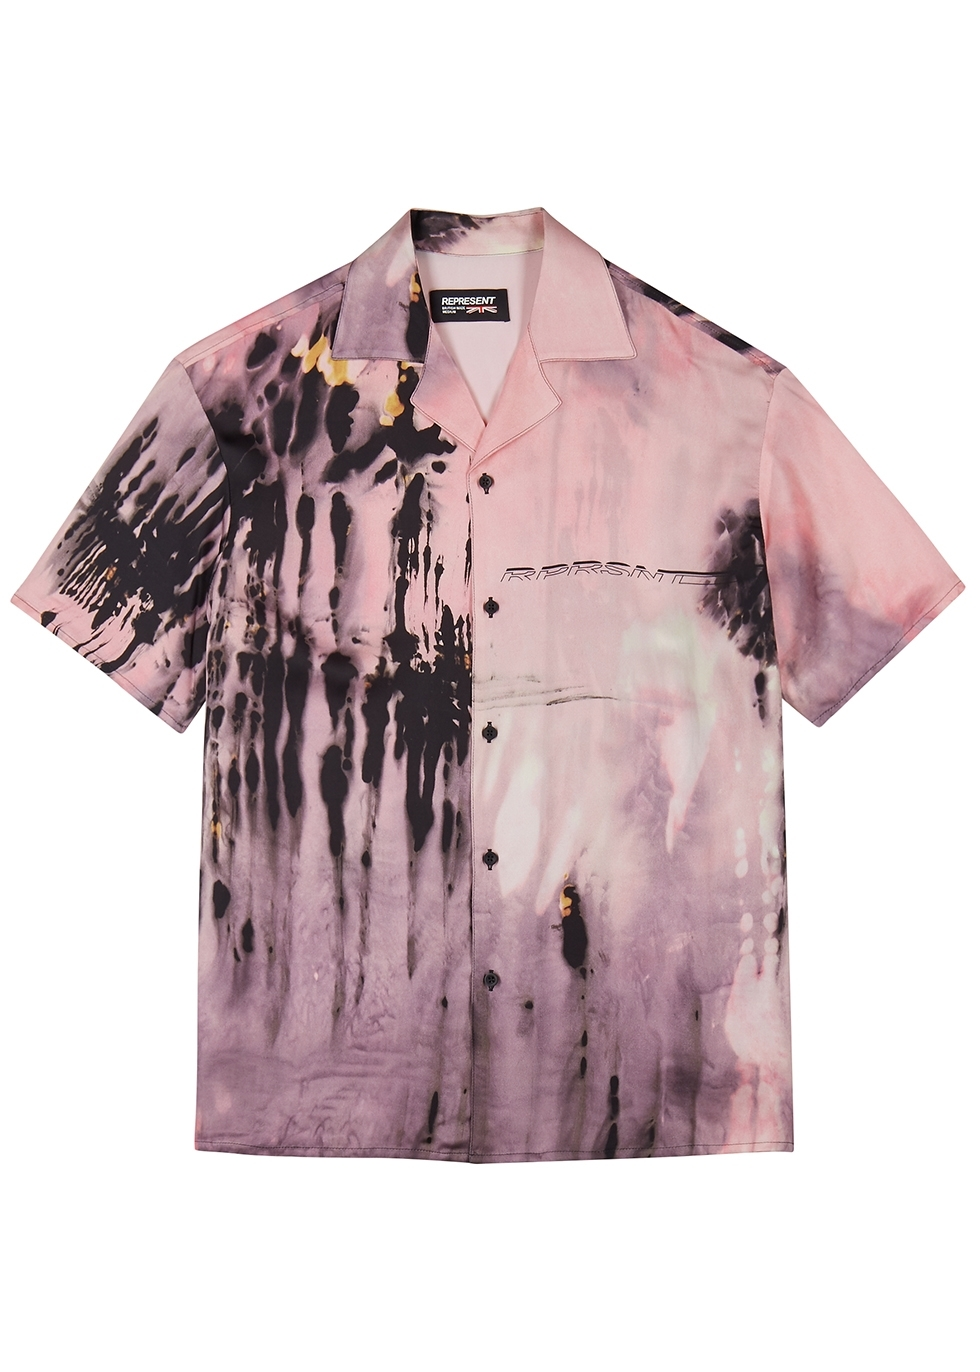 39b4eae89 Men s Designer Shirts - Harvey Nichols